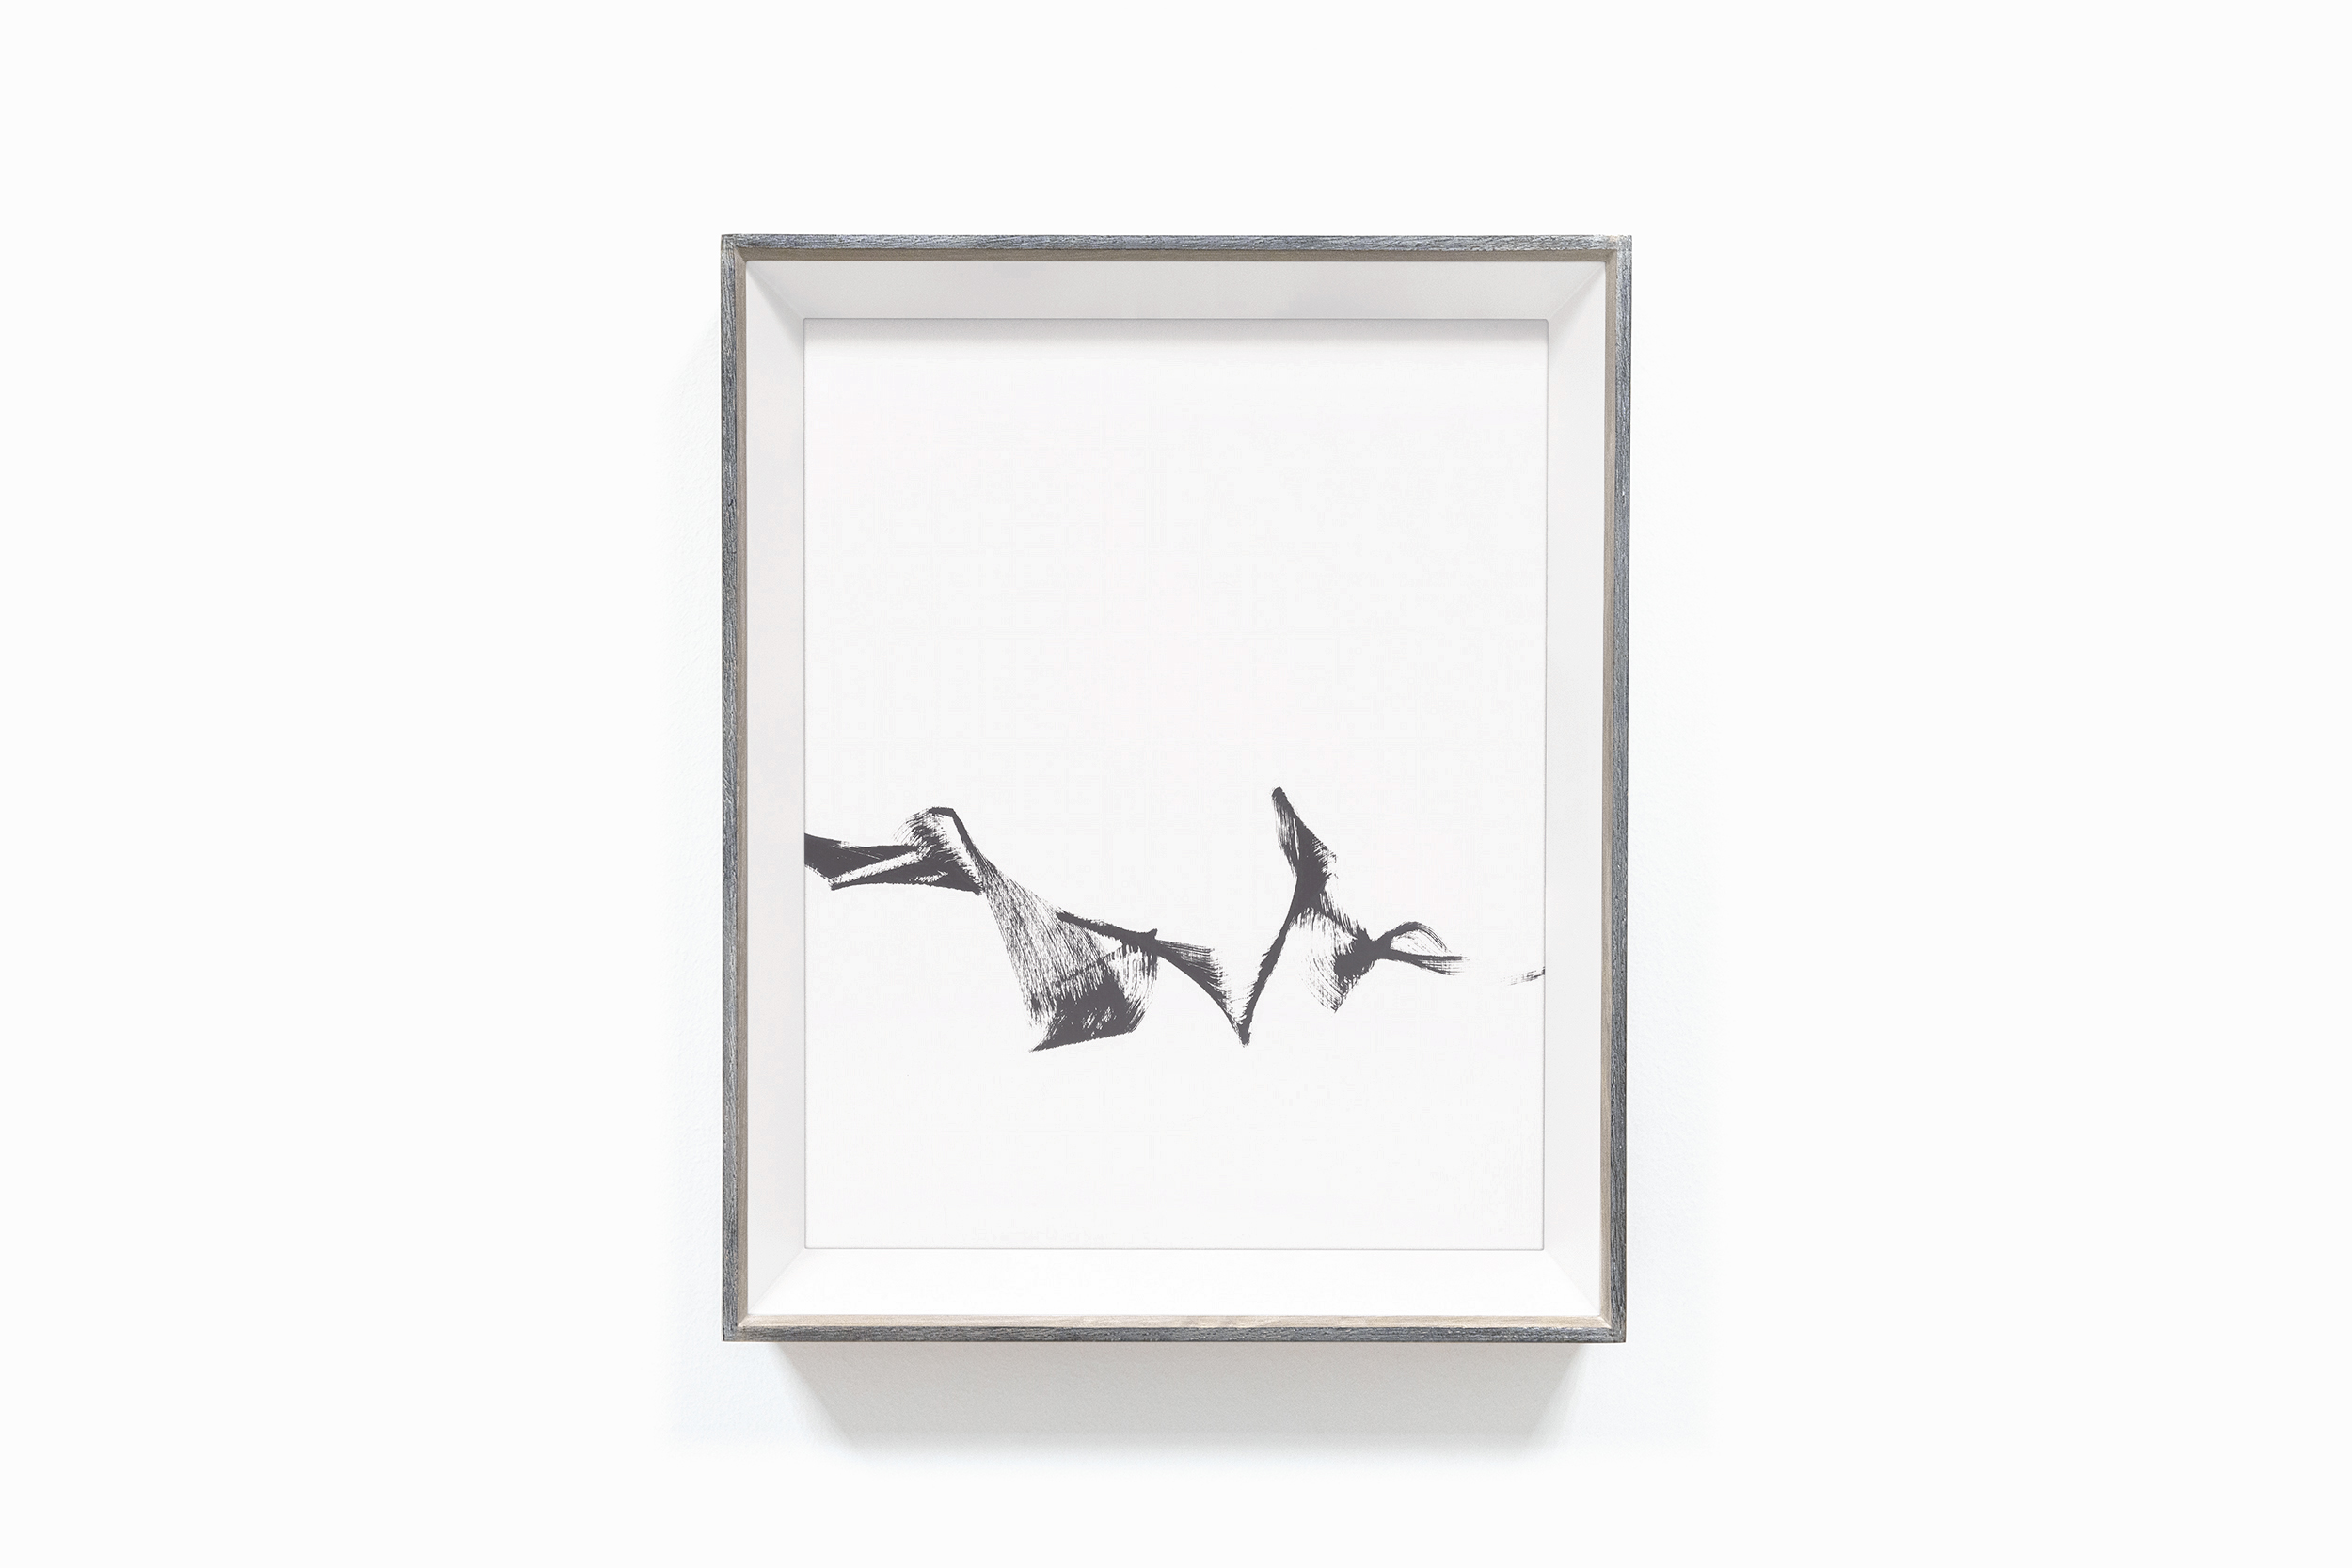 bonjourmolotov+Deambulaia+Exhibition+40x50+Illustration+Ilustracao+painting+pintura+acrylic+acrílico+canvas+tela+paper+cardboard+mdf+Andre+Gigante+15N8E.jpg